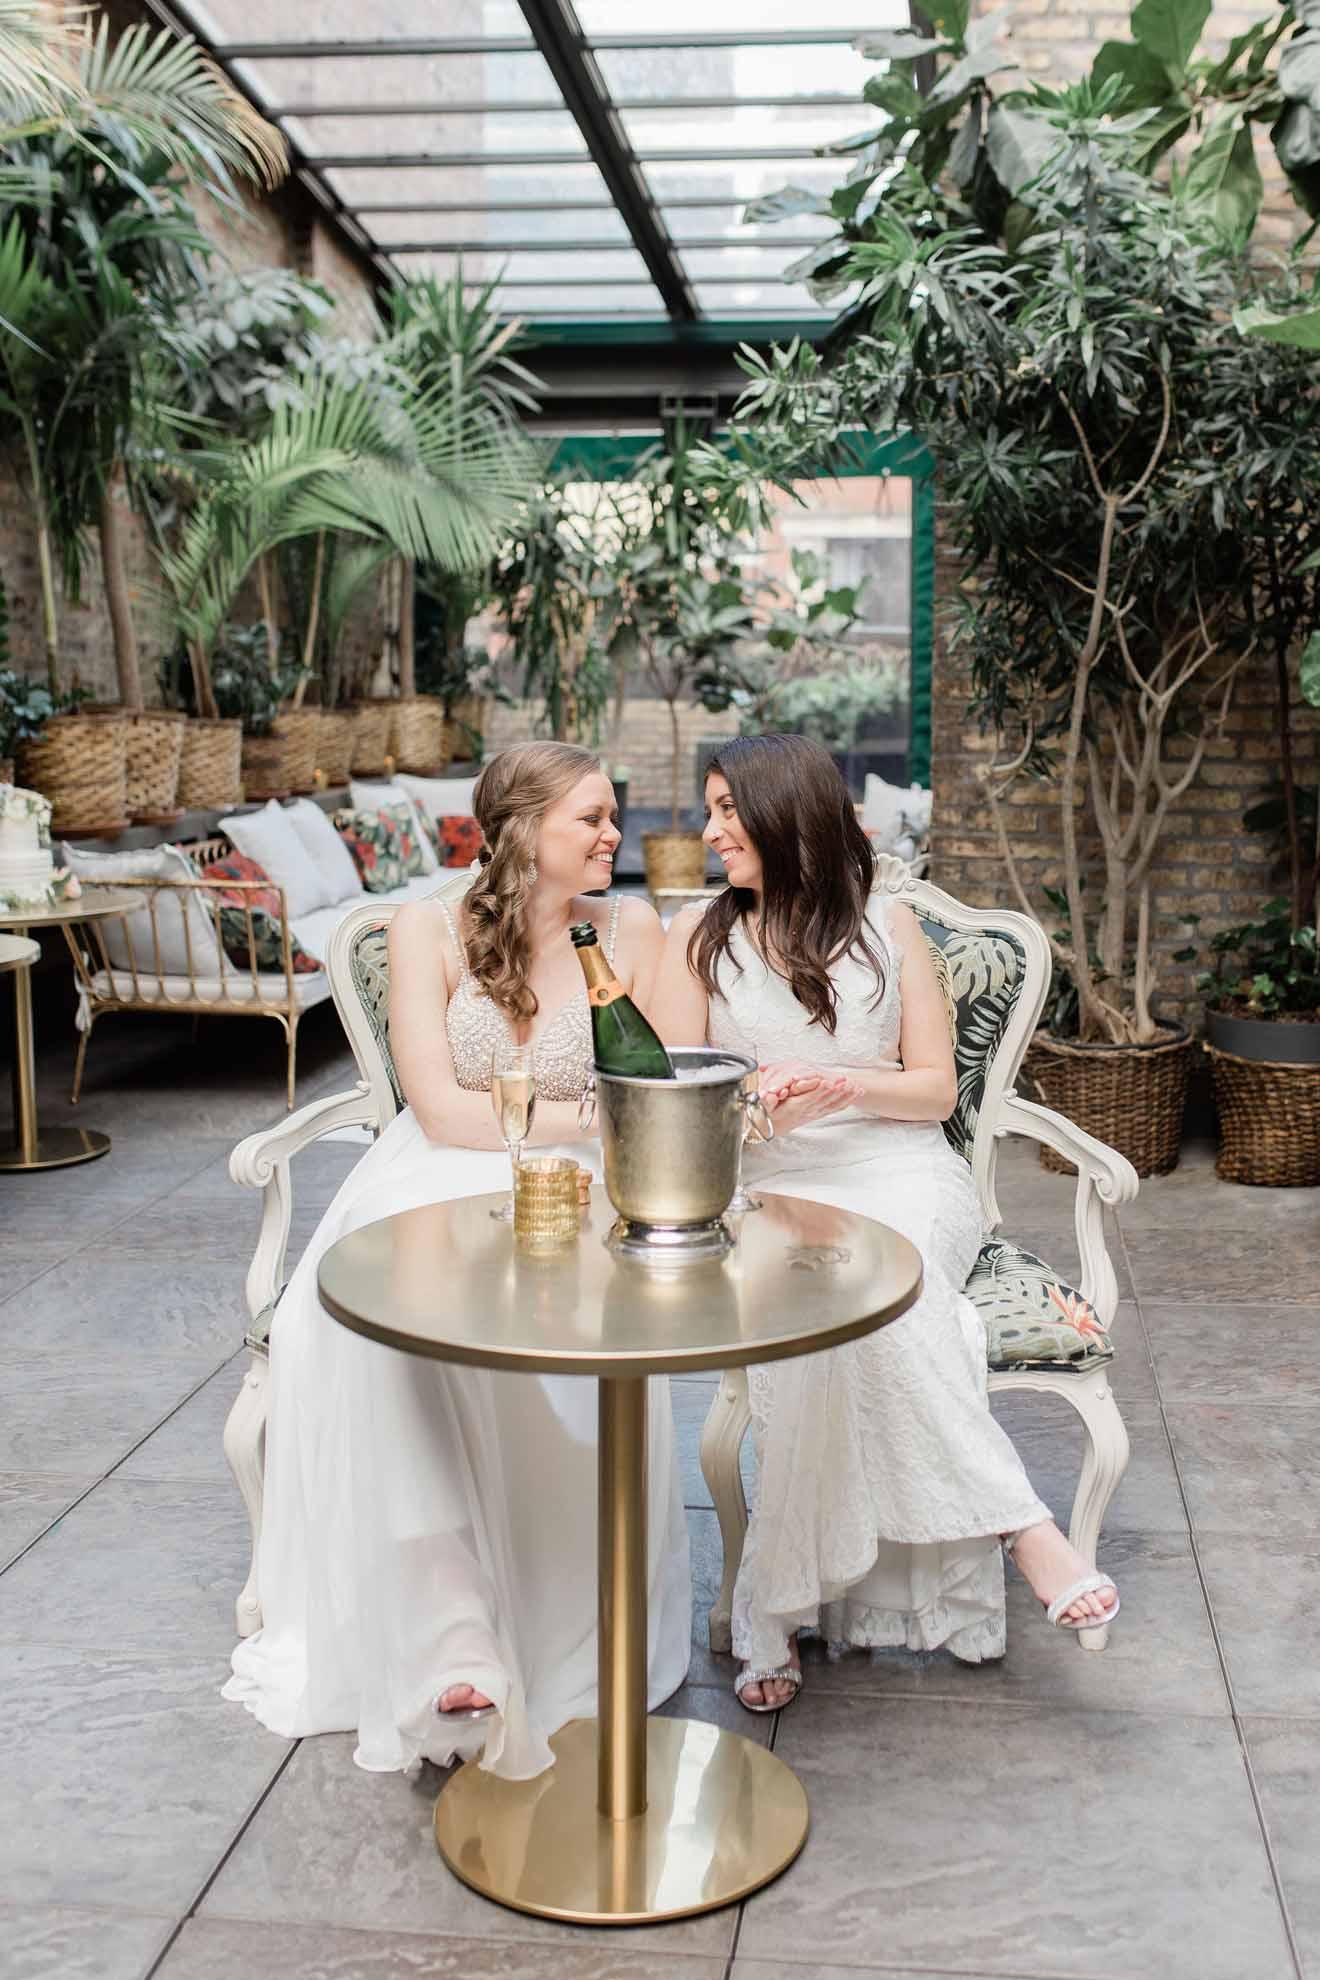 Grey Garden Creative Chicago America lesbian two brides same-sex wedding photography Dancing With Her worldwide print magazine